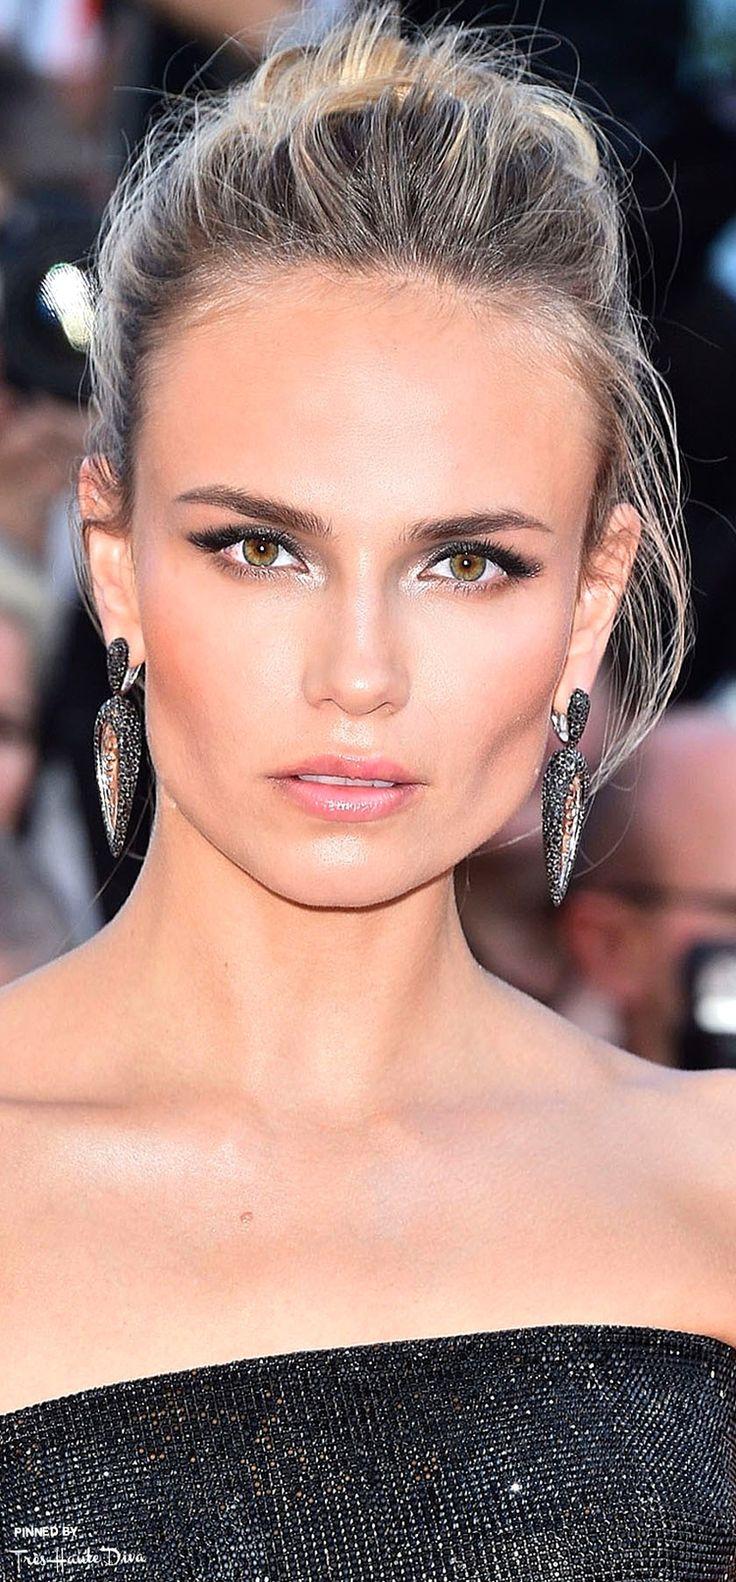 #Natasha #Poly♔ Cannes Film Festival 2015 Red Carpet ♔ Très Haute Diva ♔